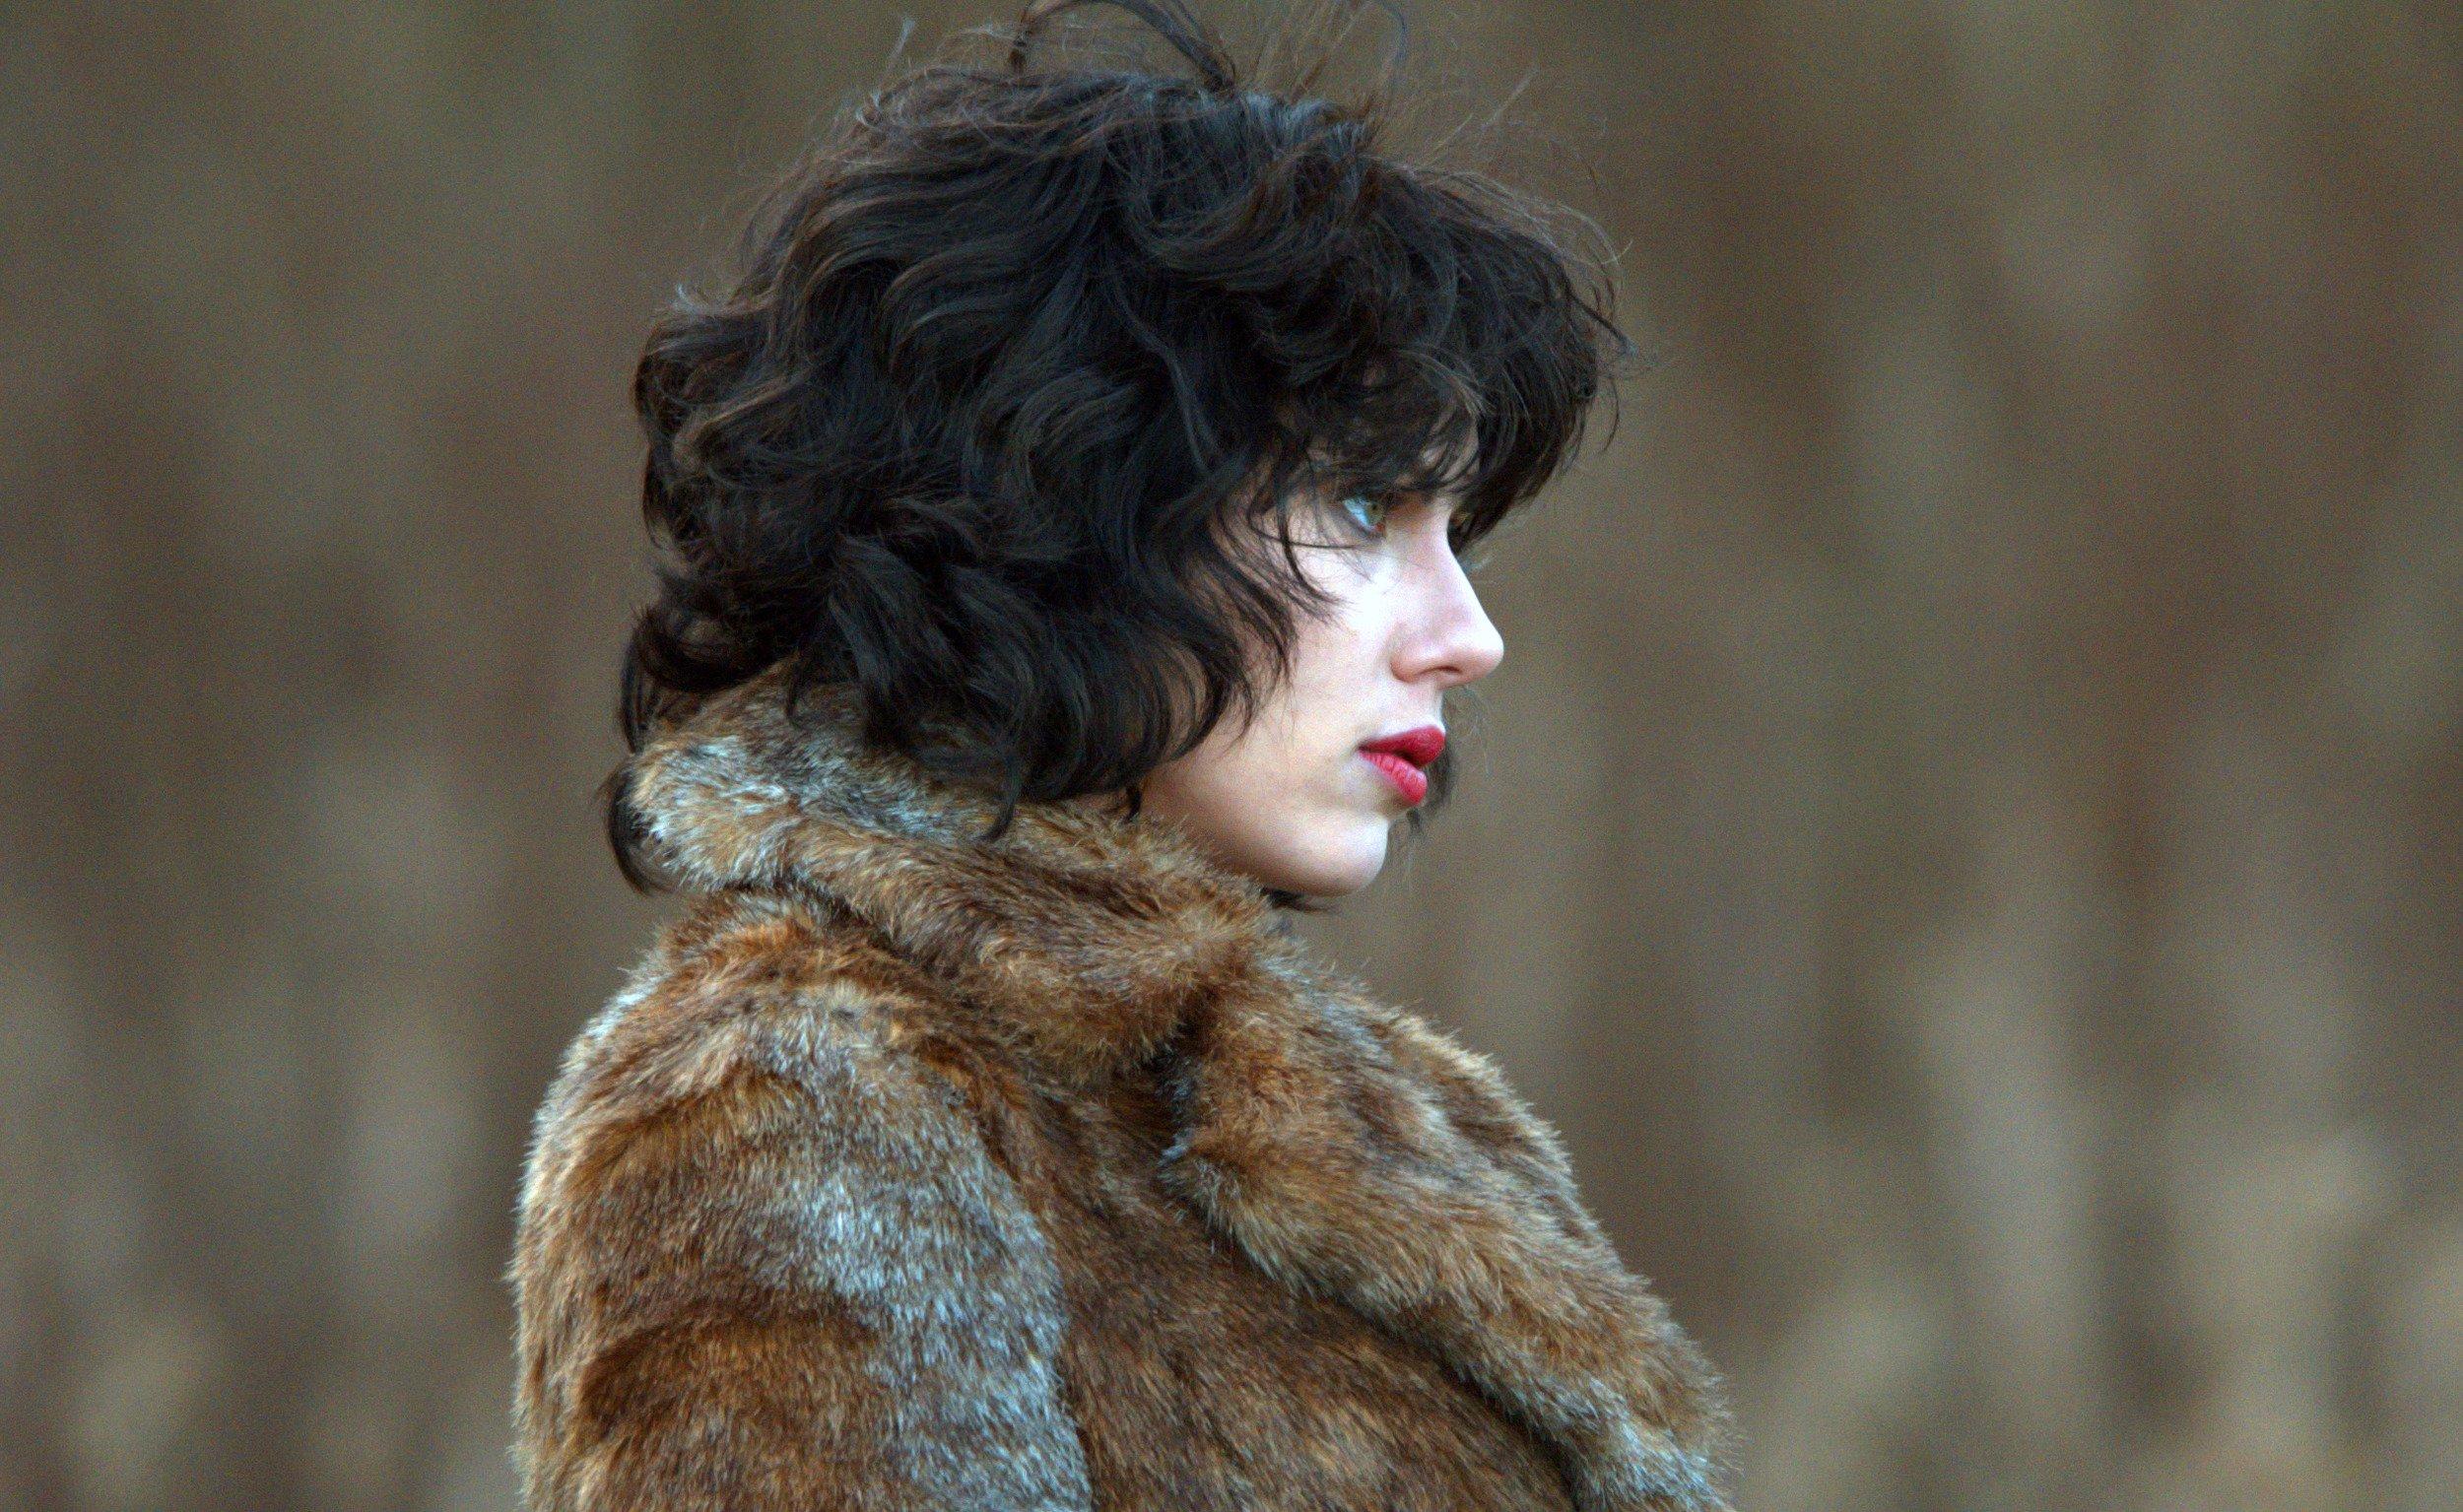 film-streaming-under-the-skin-scarlet-johansson